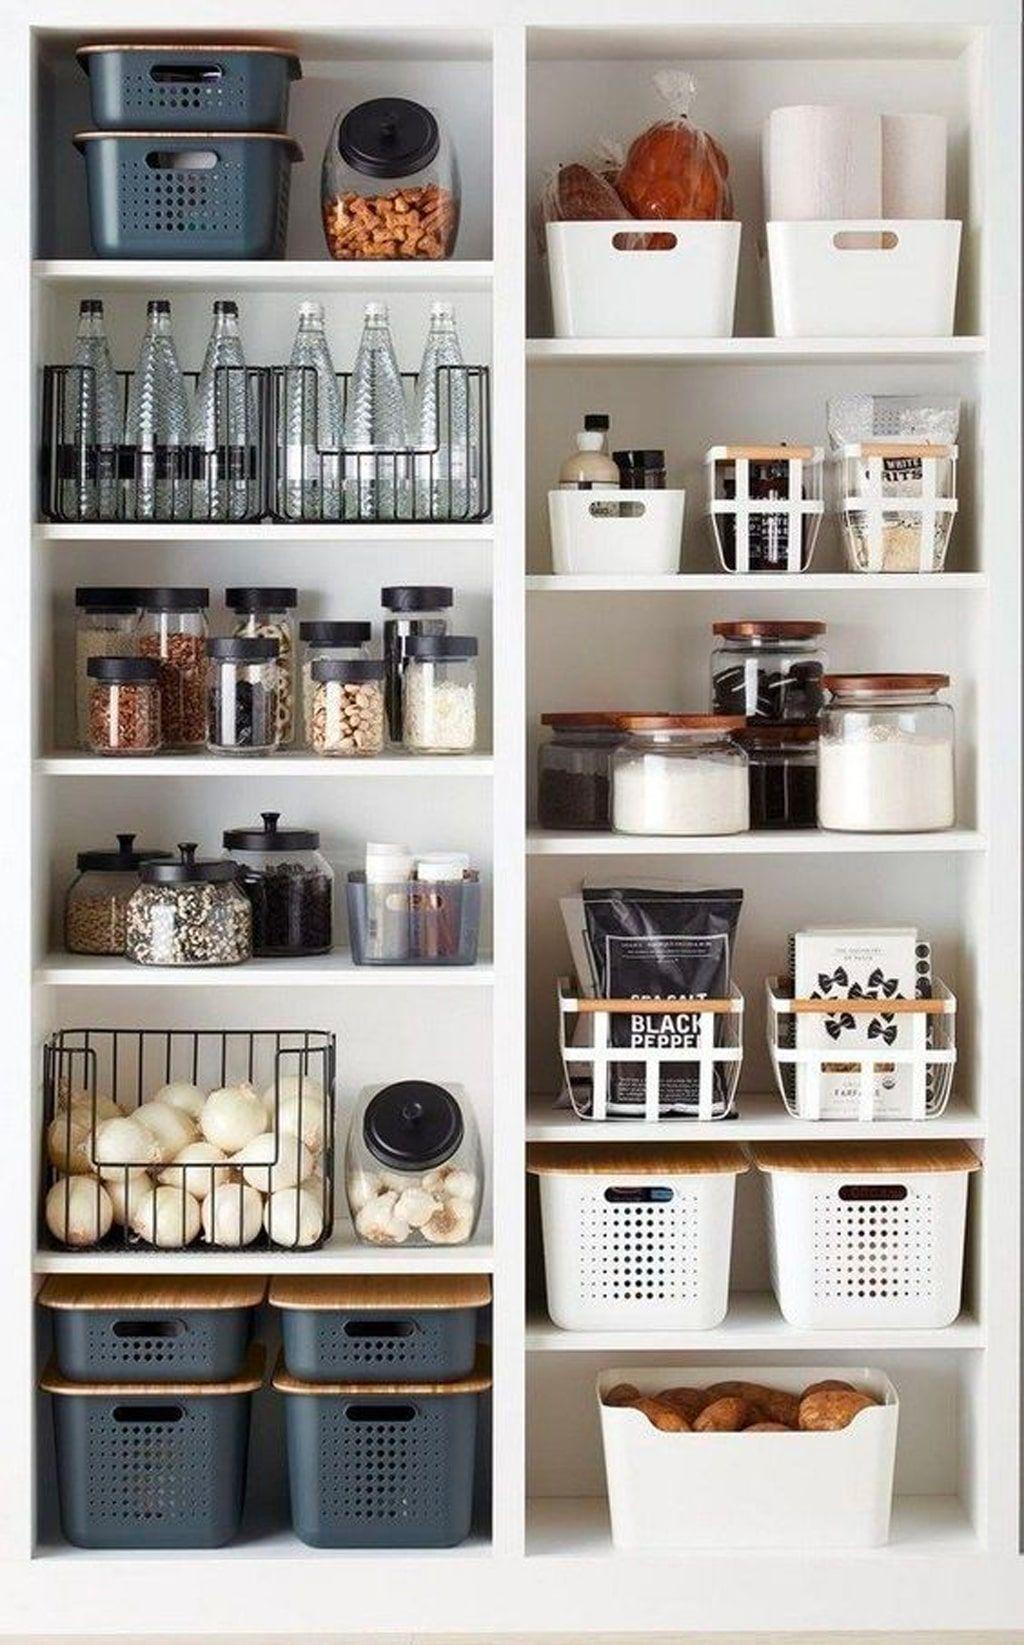 Kitchen Organisation When You're Renovating